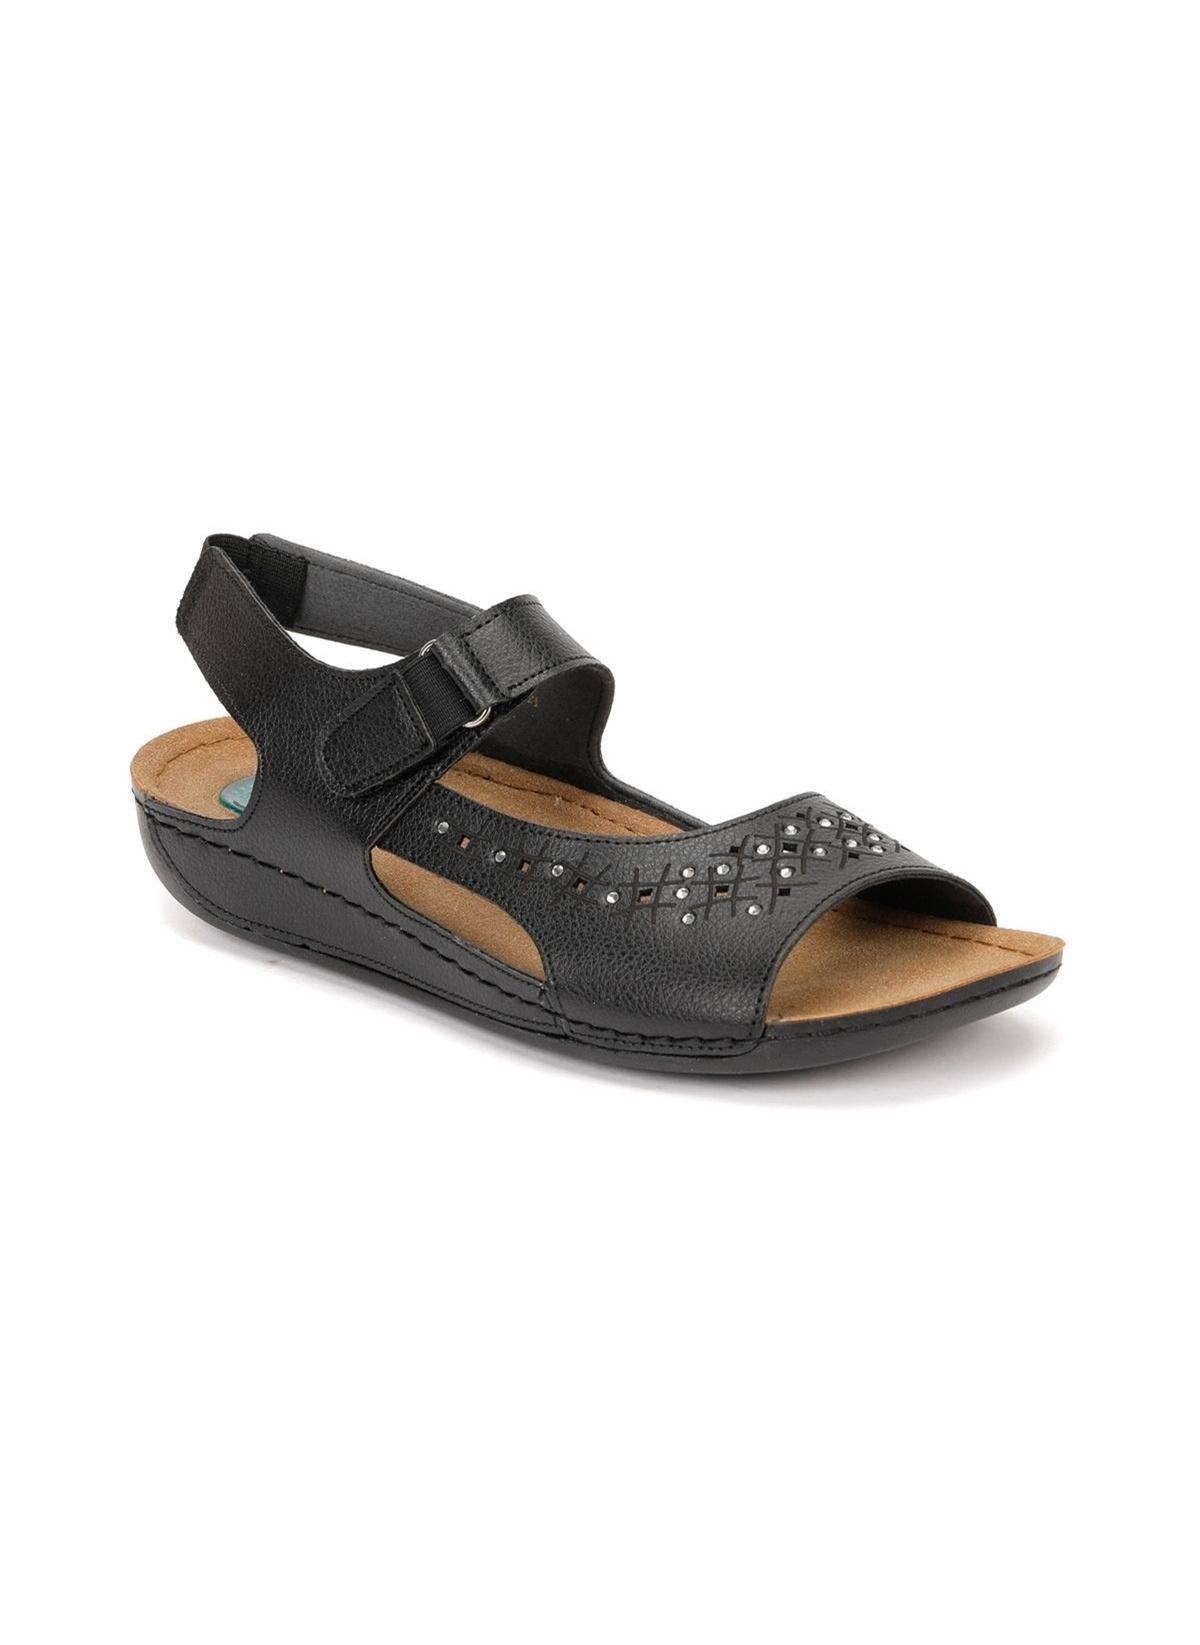 Polaris Sandalet 81.157352.z Basic Comfort – 62.49 TL